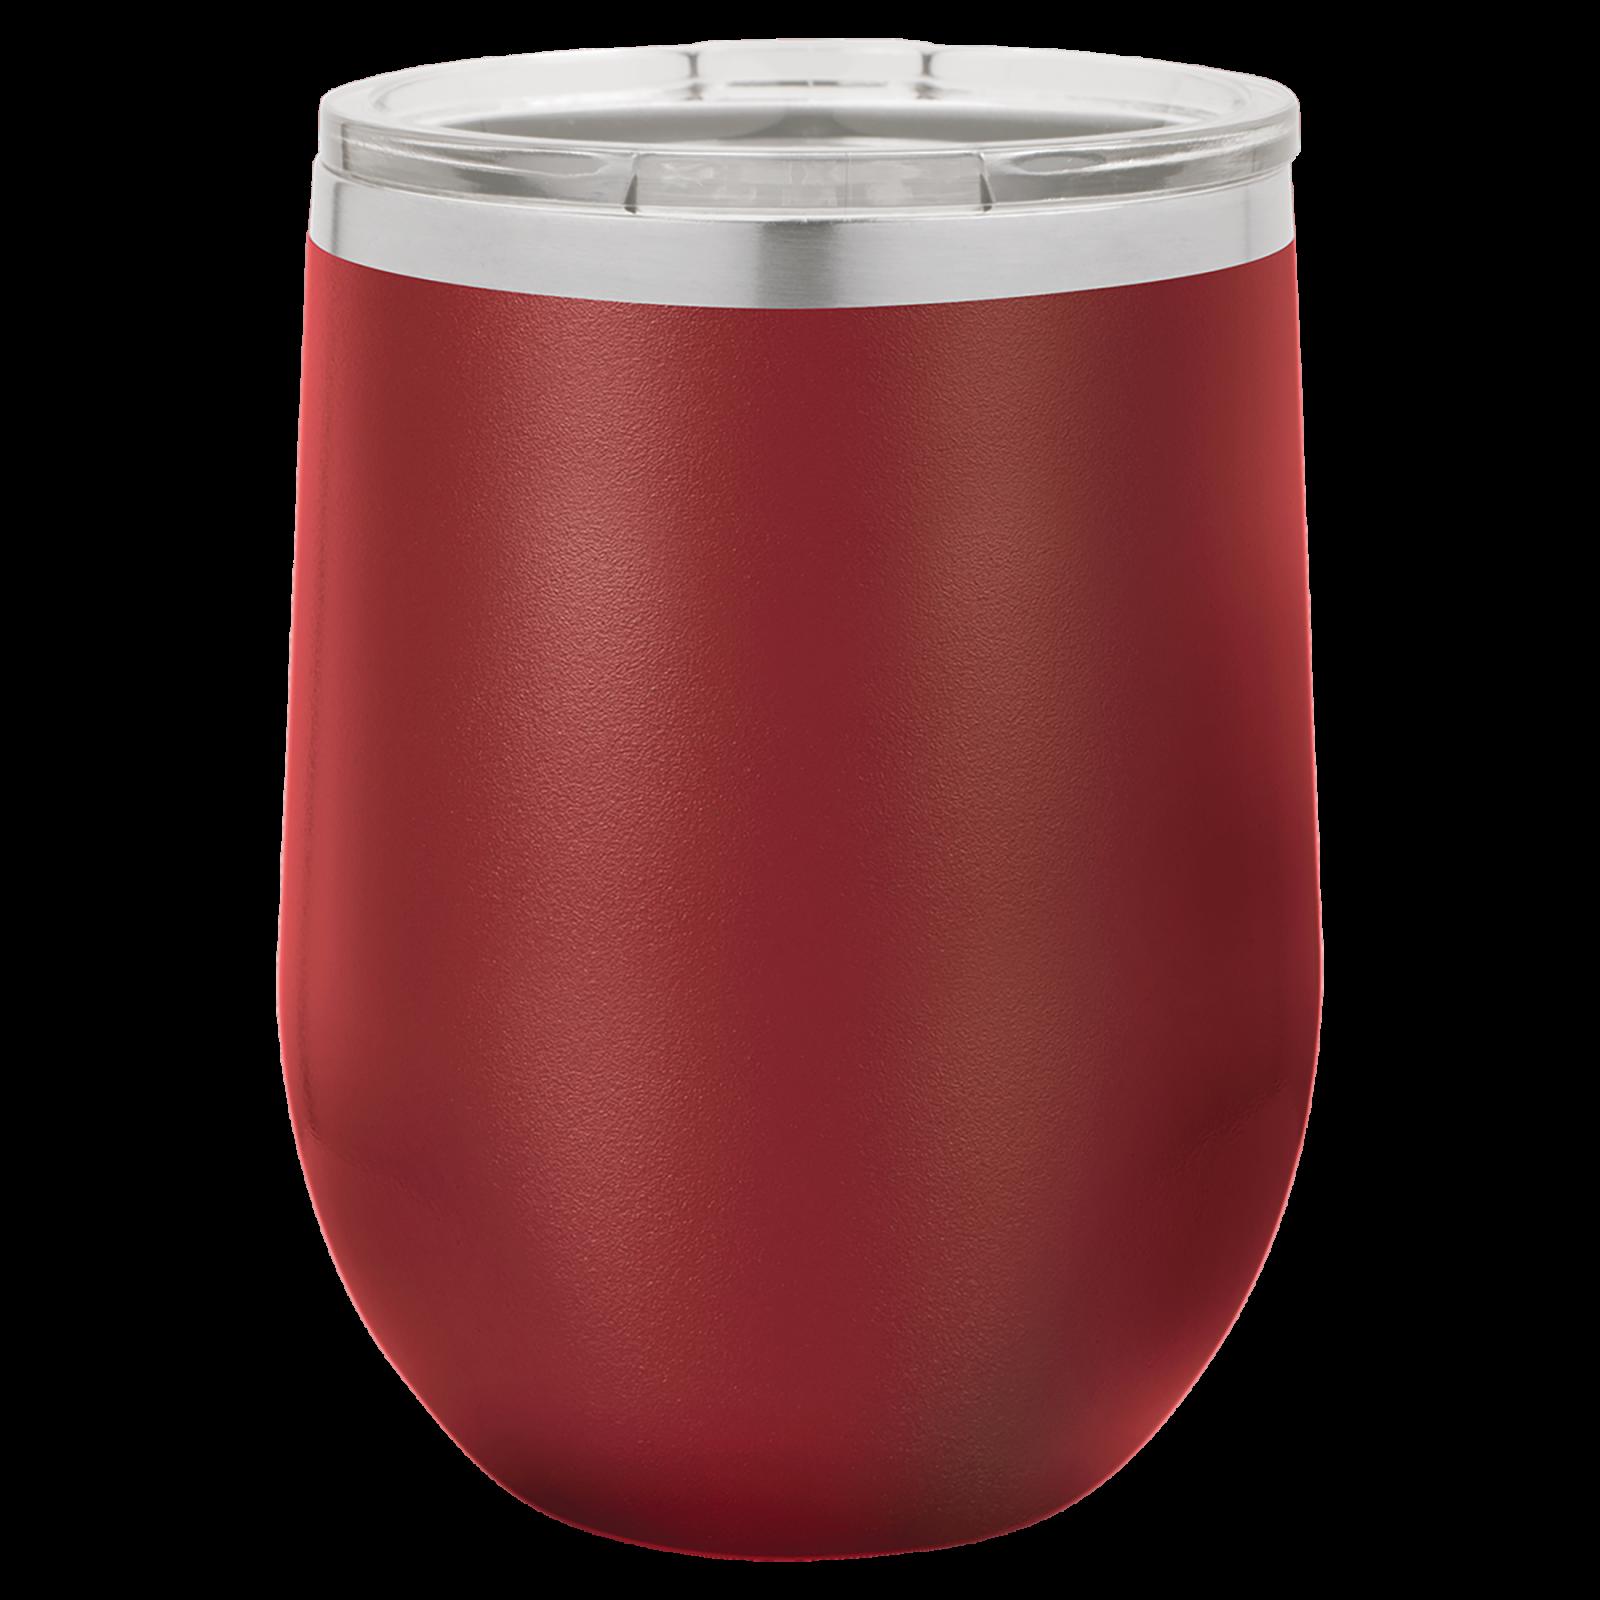 12 oz stemless wine cup MAROON